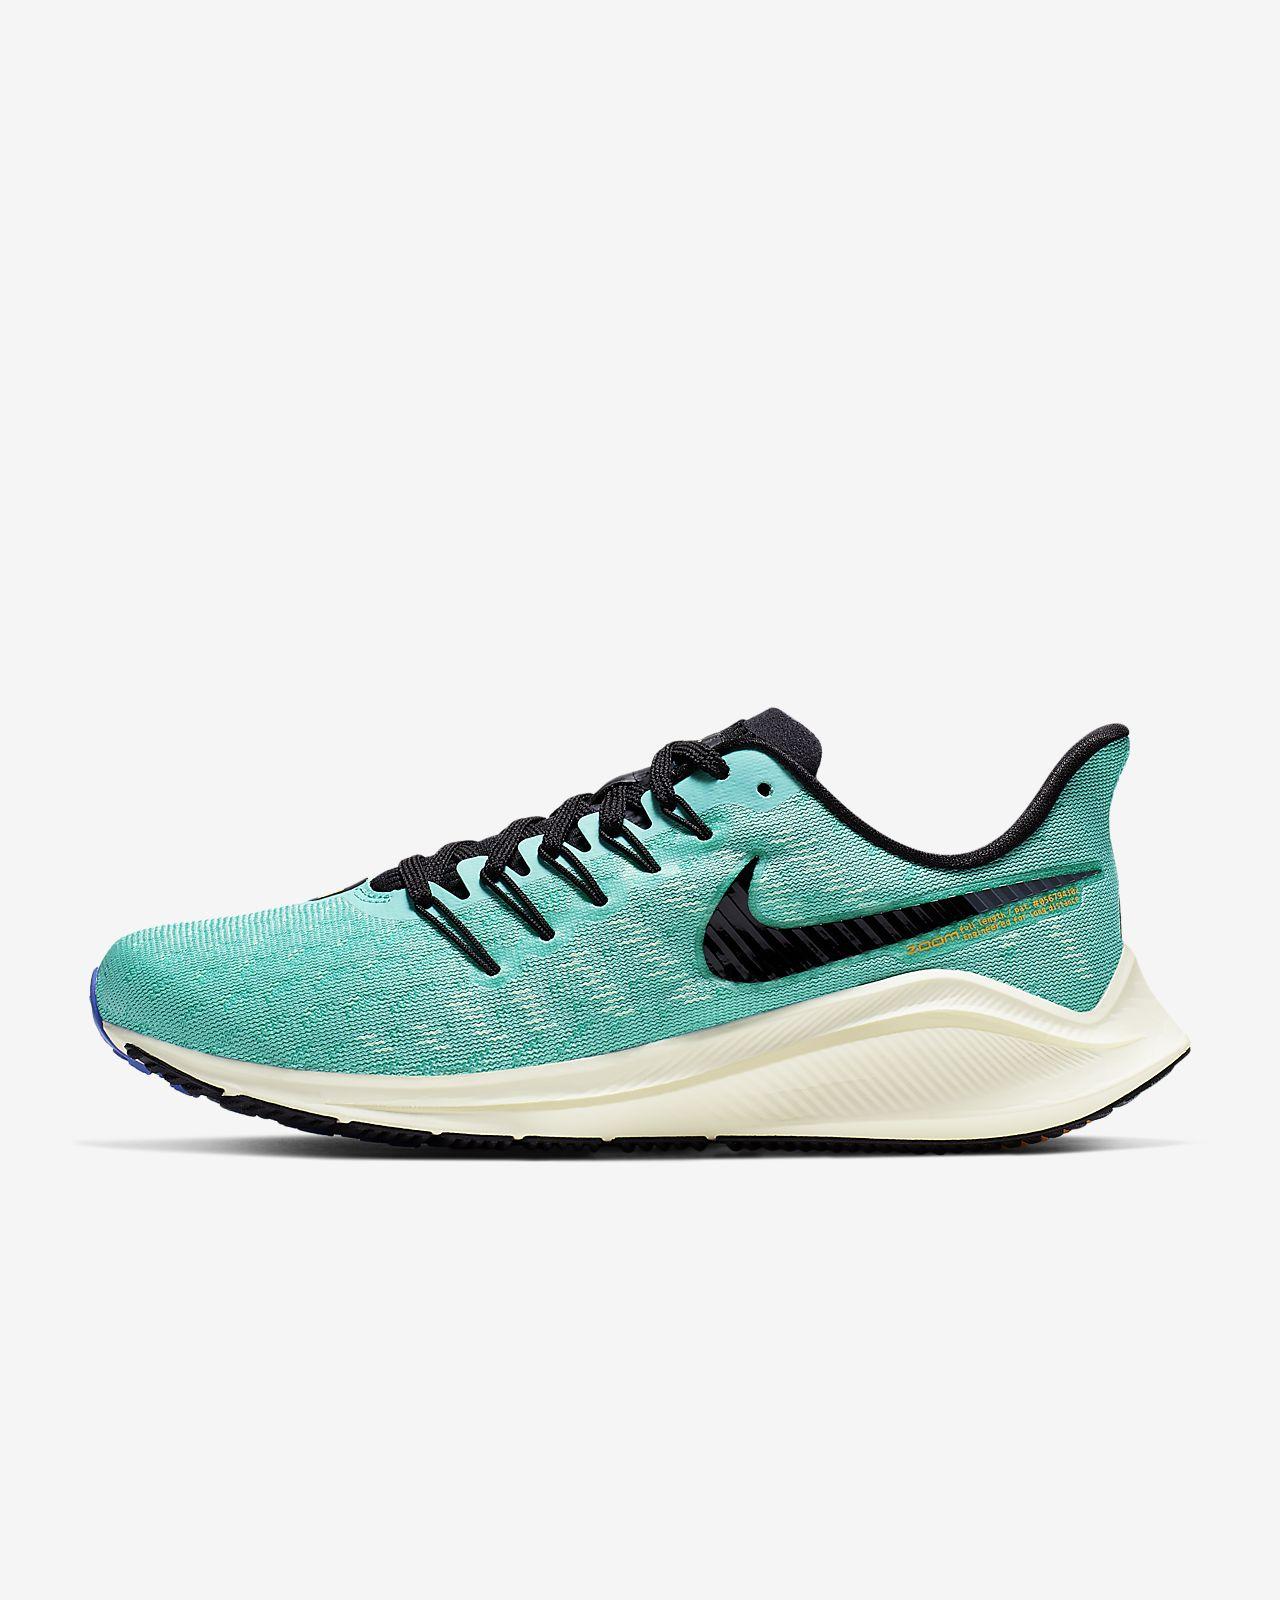 Nike Air Zoom Vomero 14-løbesko til kvinder